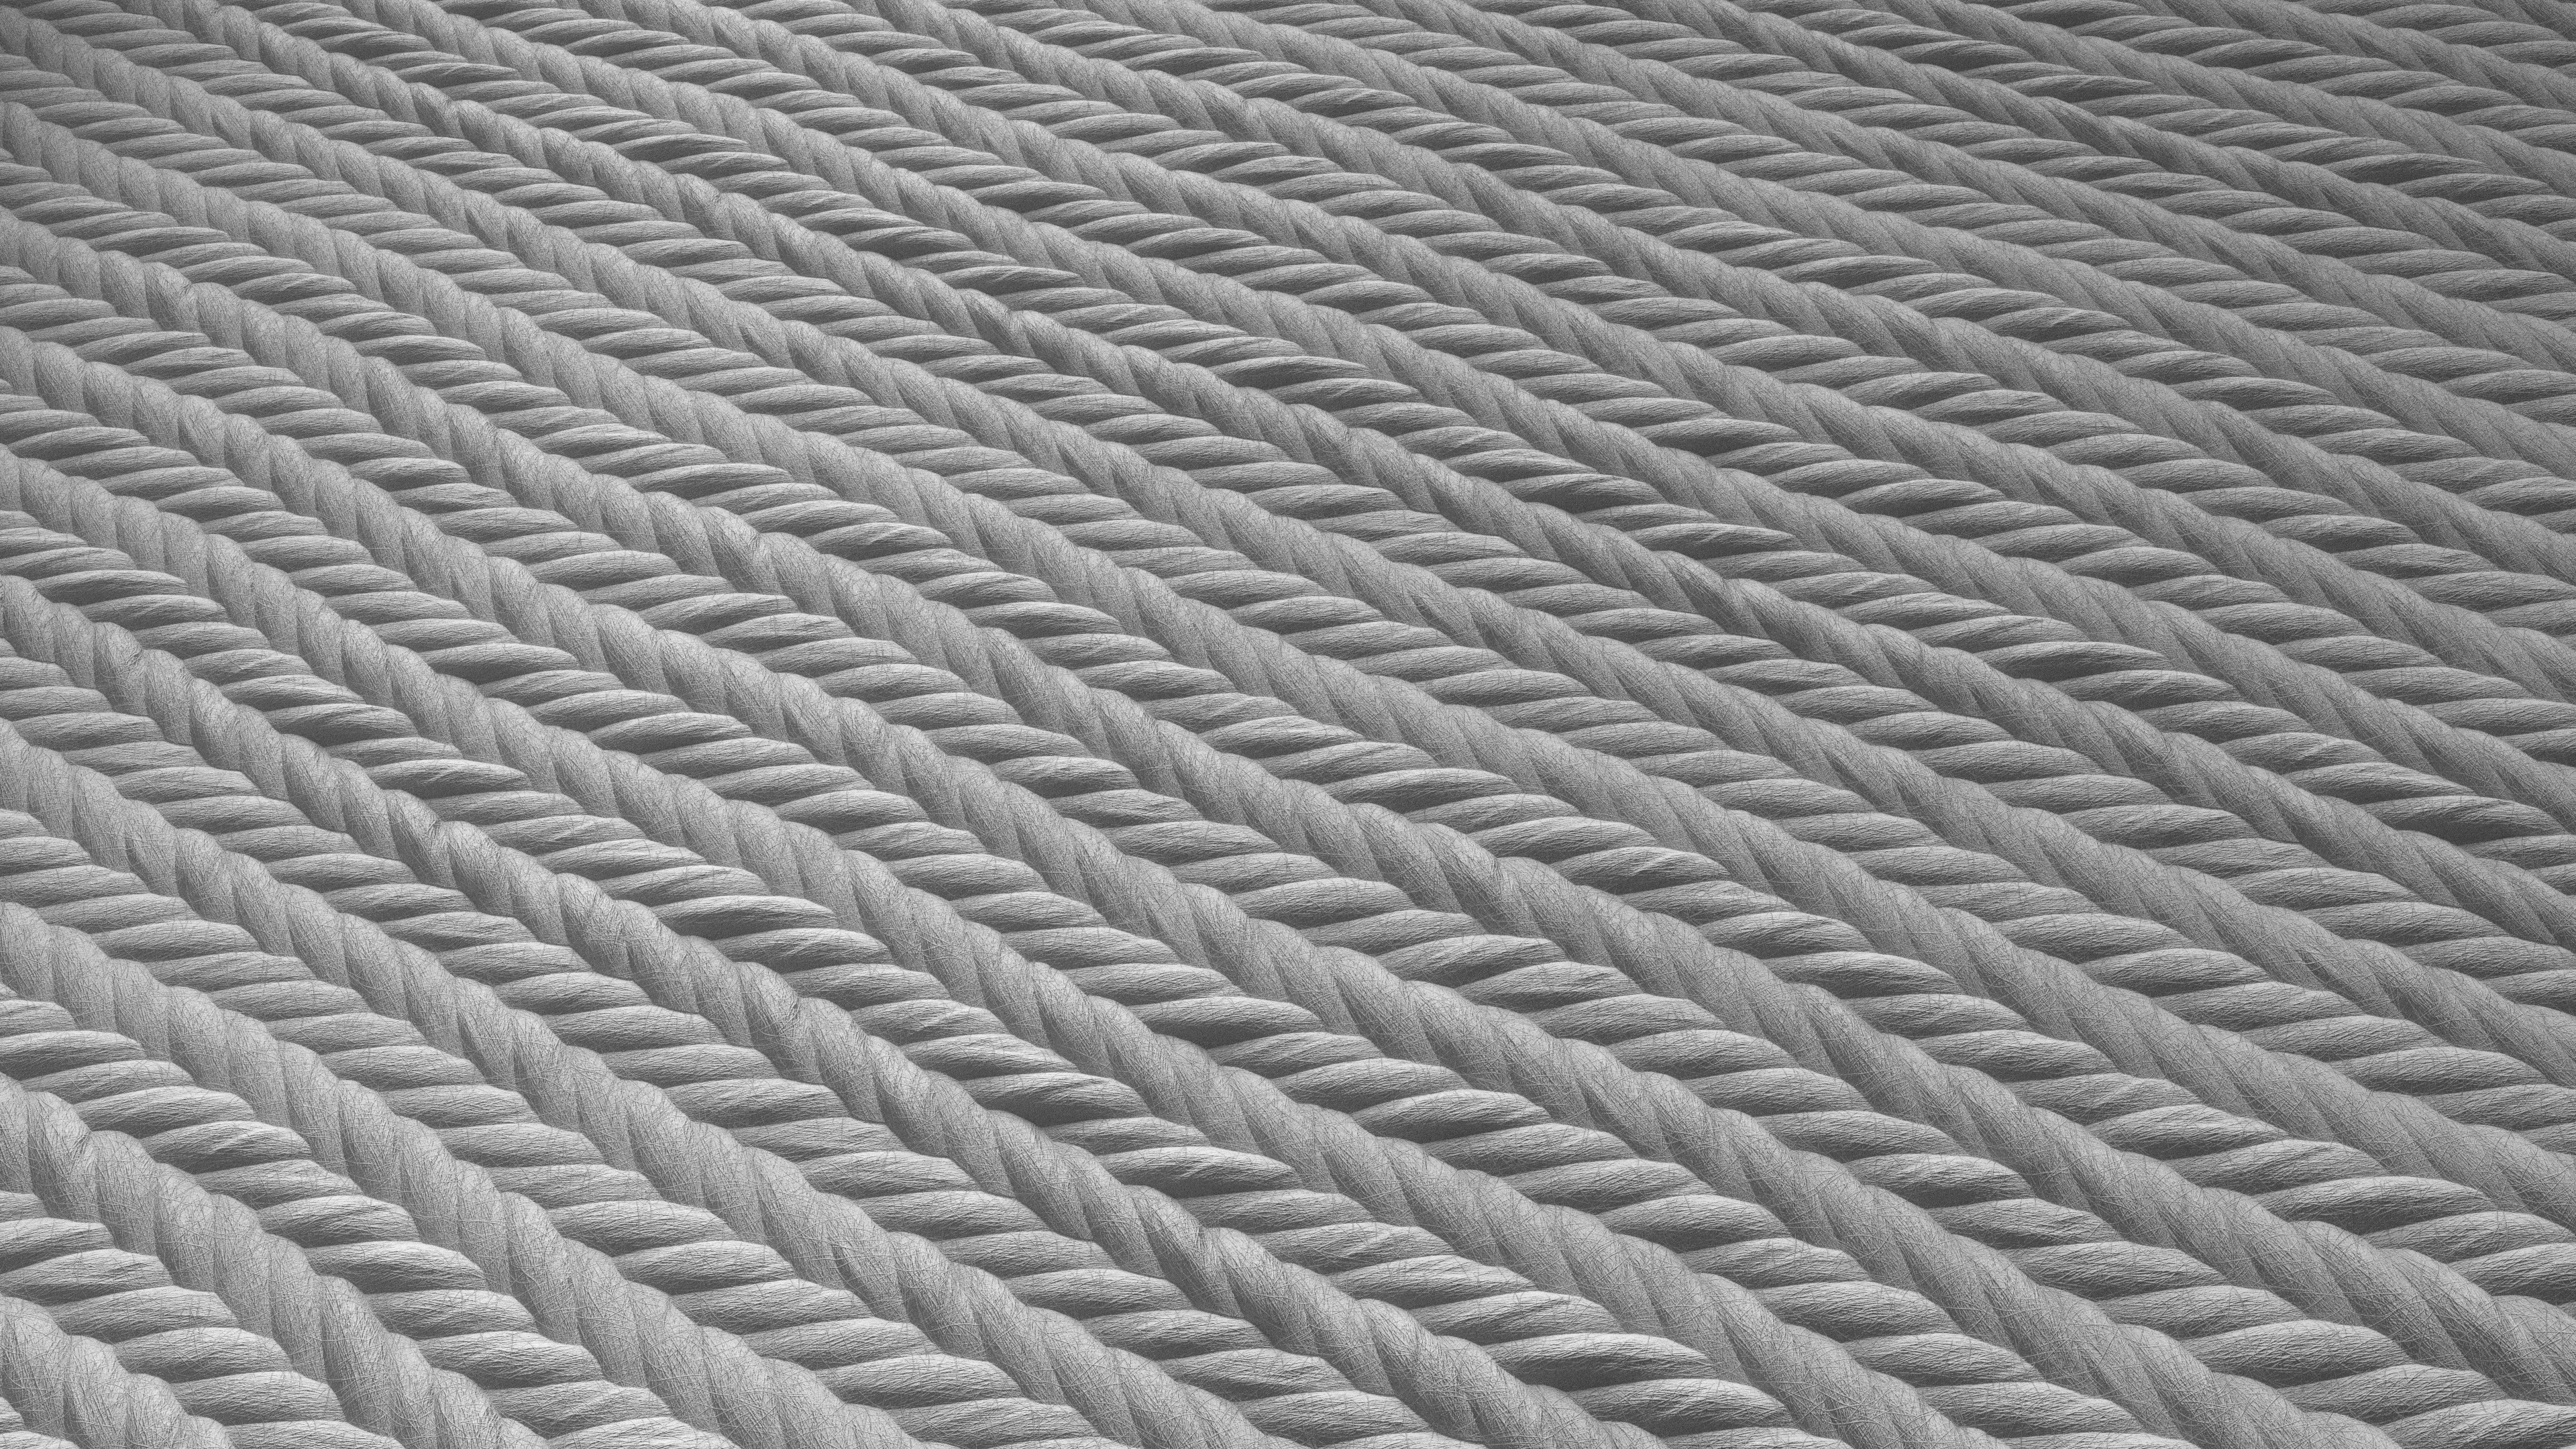 Tri-color Wool Fabric - PBR0422